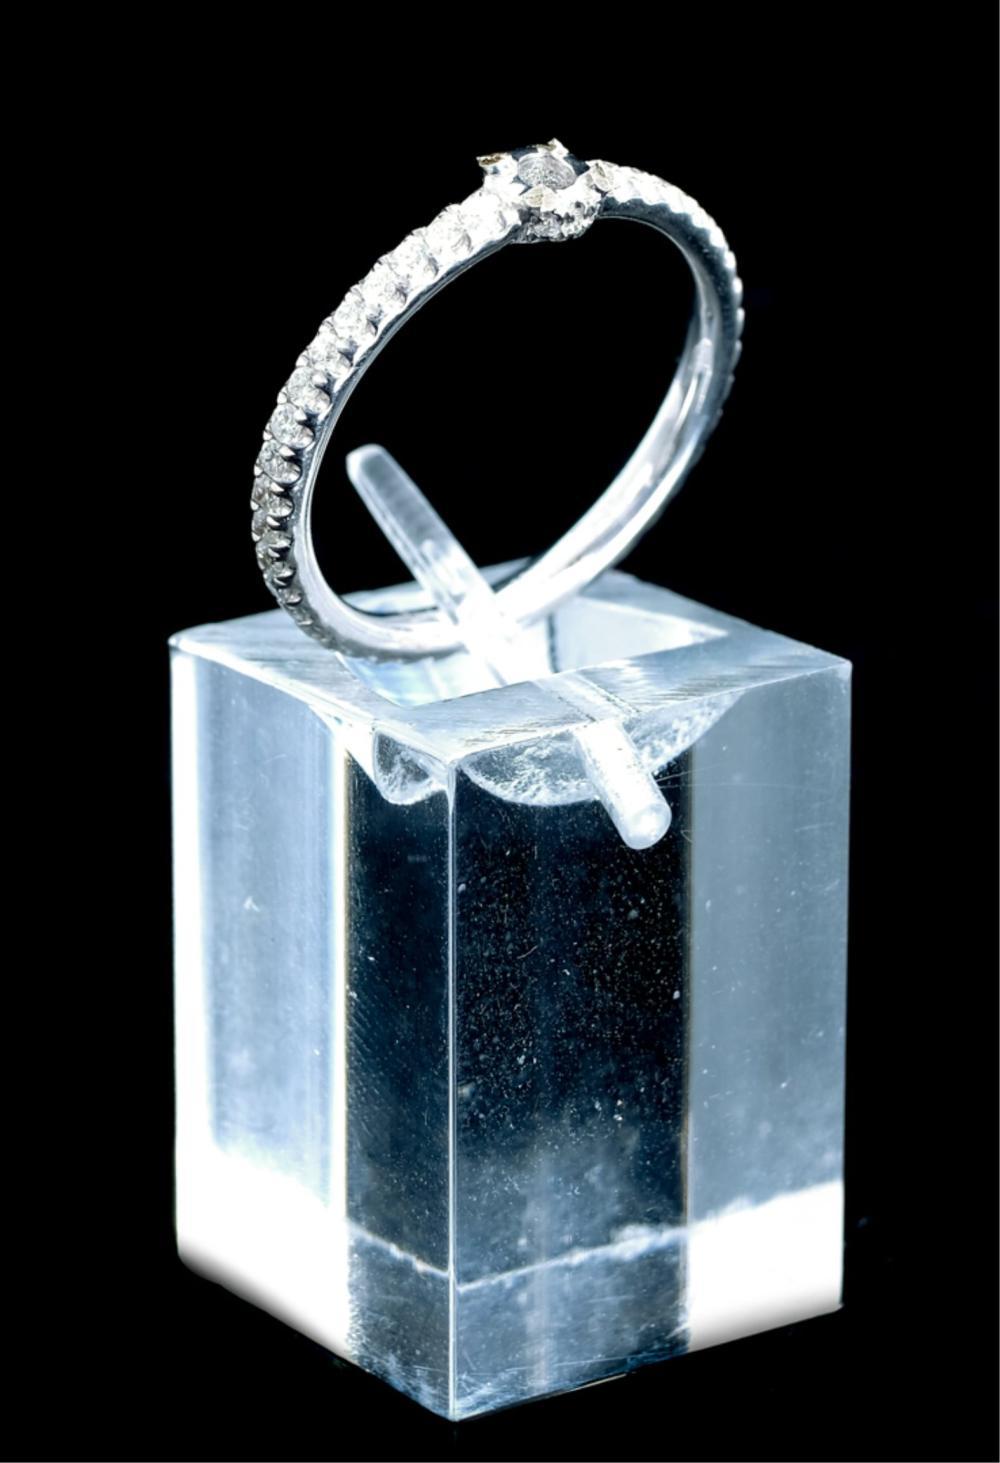 18k White Gold & Diamond Ring Band